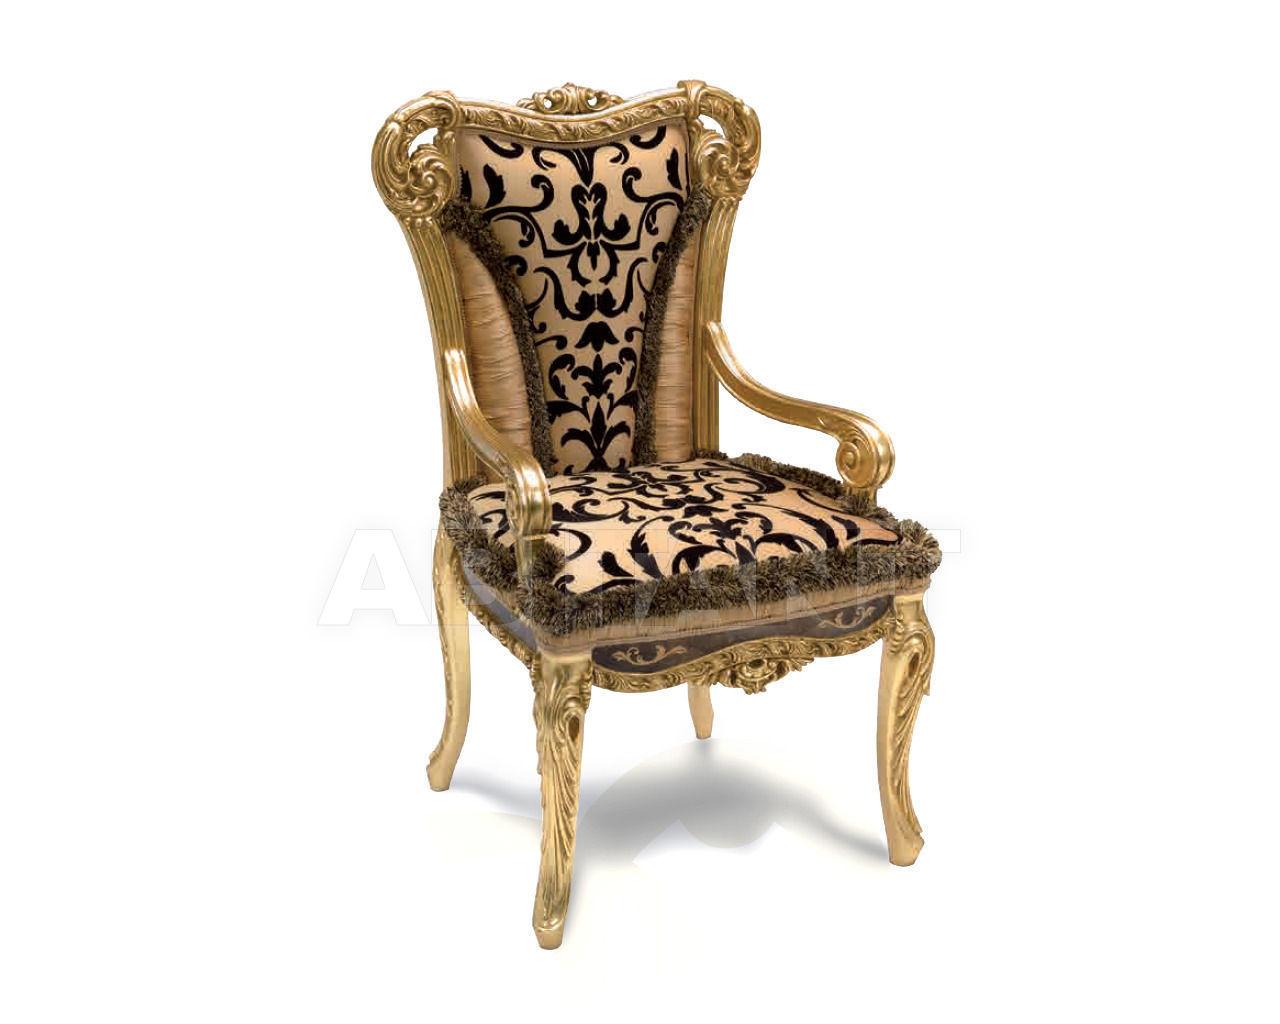 Купить Стул с подлокотниками Stil Salotti di Origgi Luigi e Figli s.n.c. Origgi Antares chair3